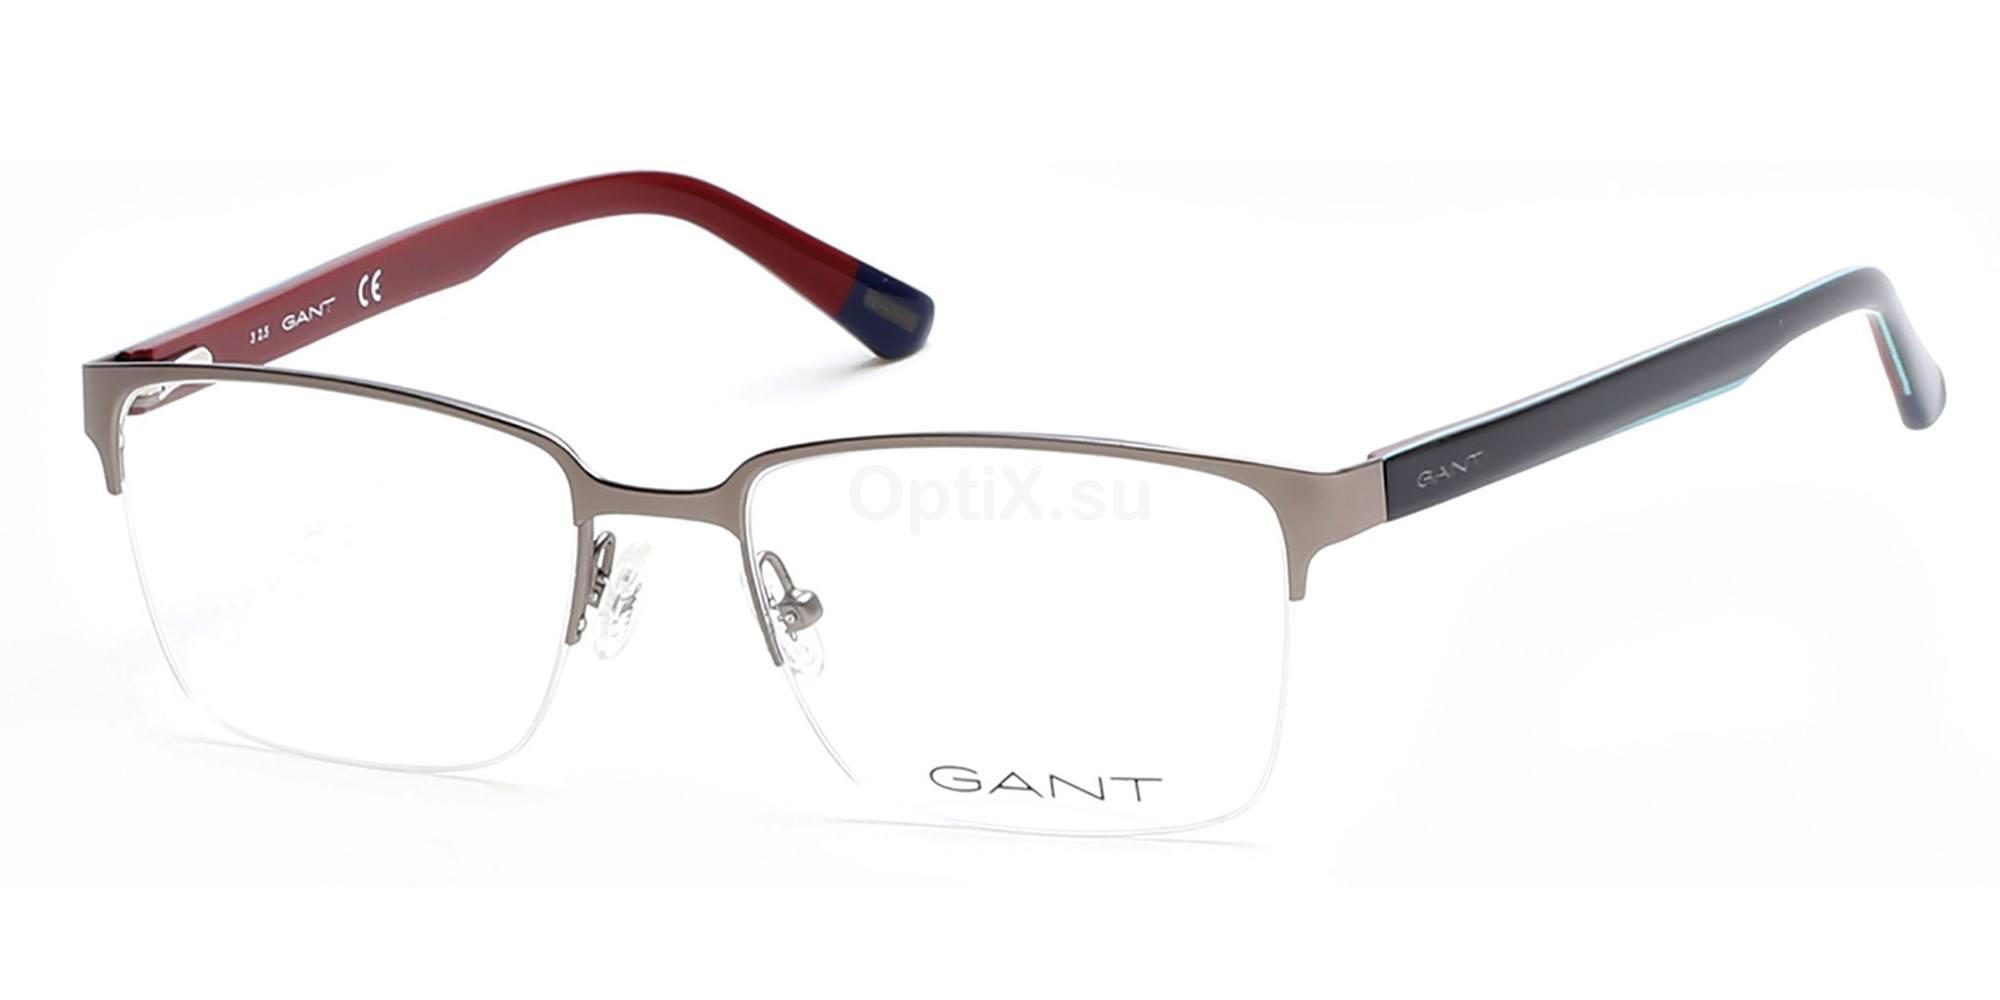 009 GA3111 , Gant